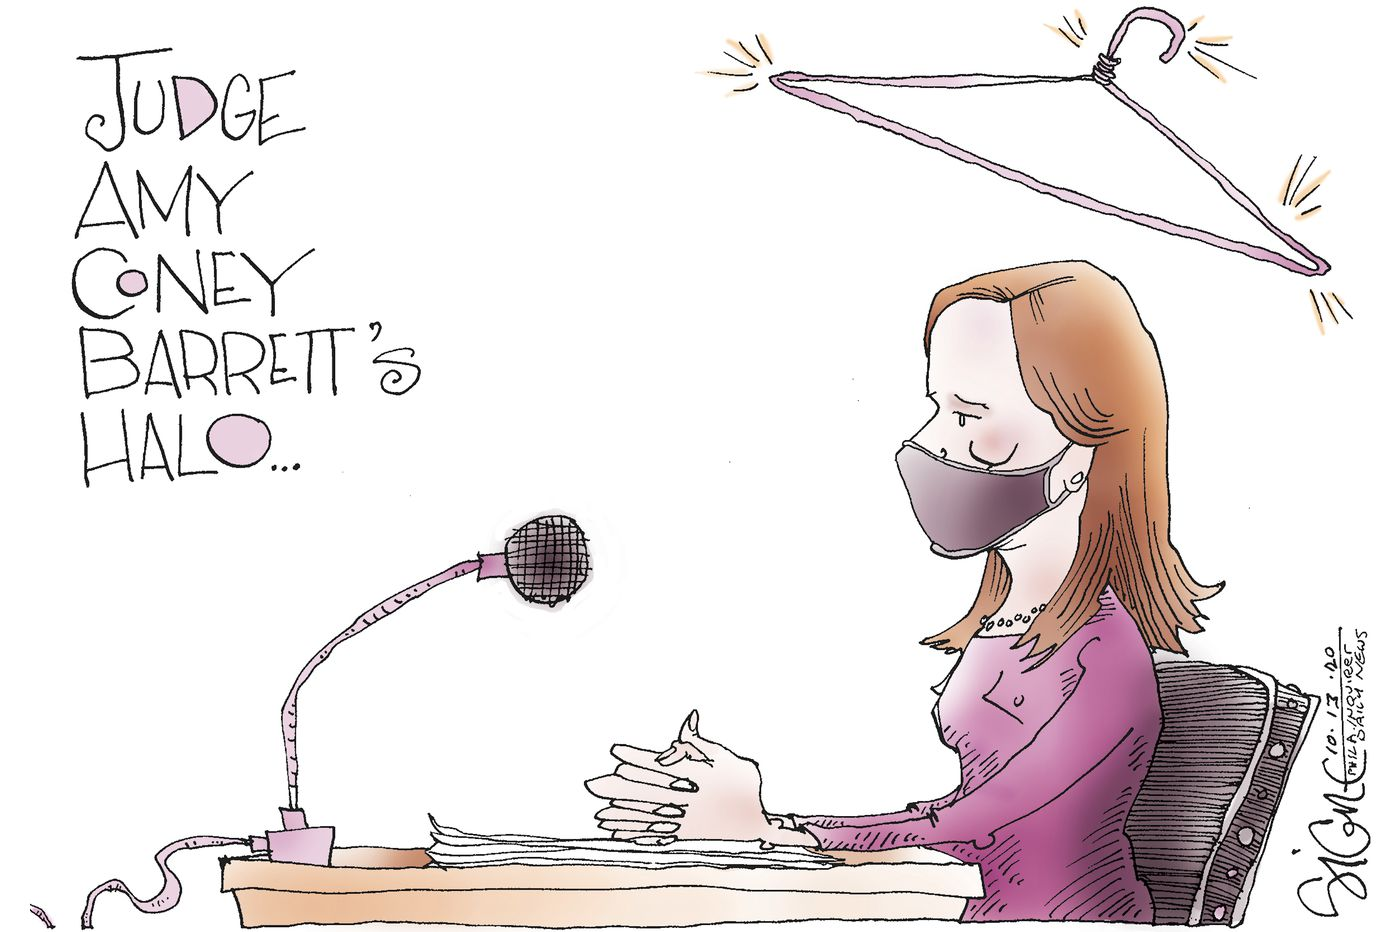 Political Cartoon: Amy Coney Barrett's confirmation halo